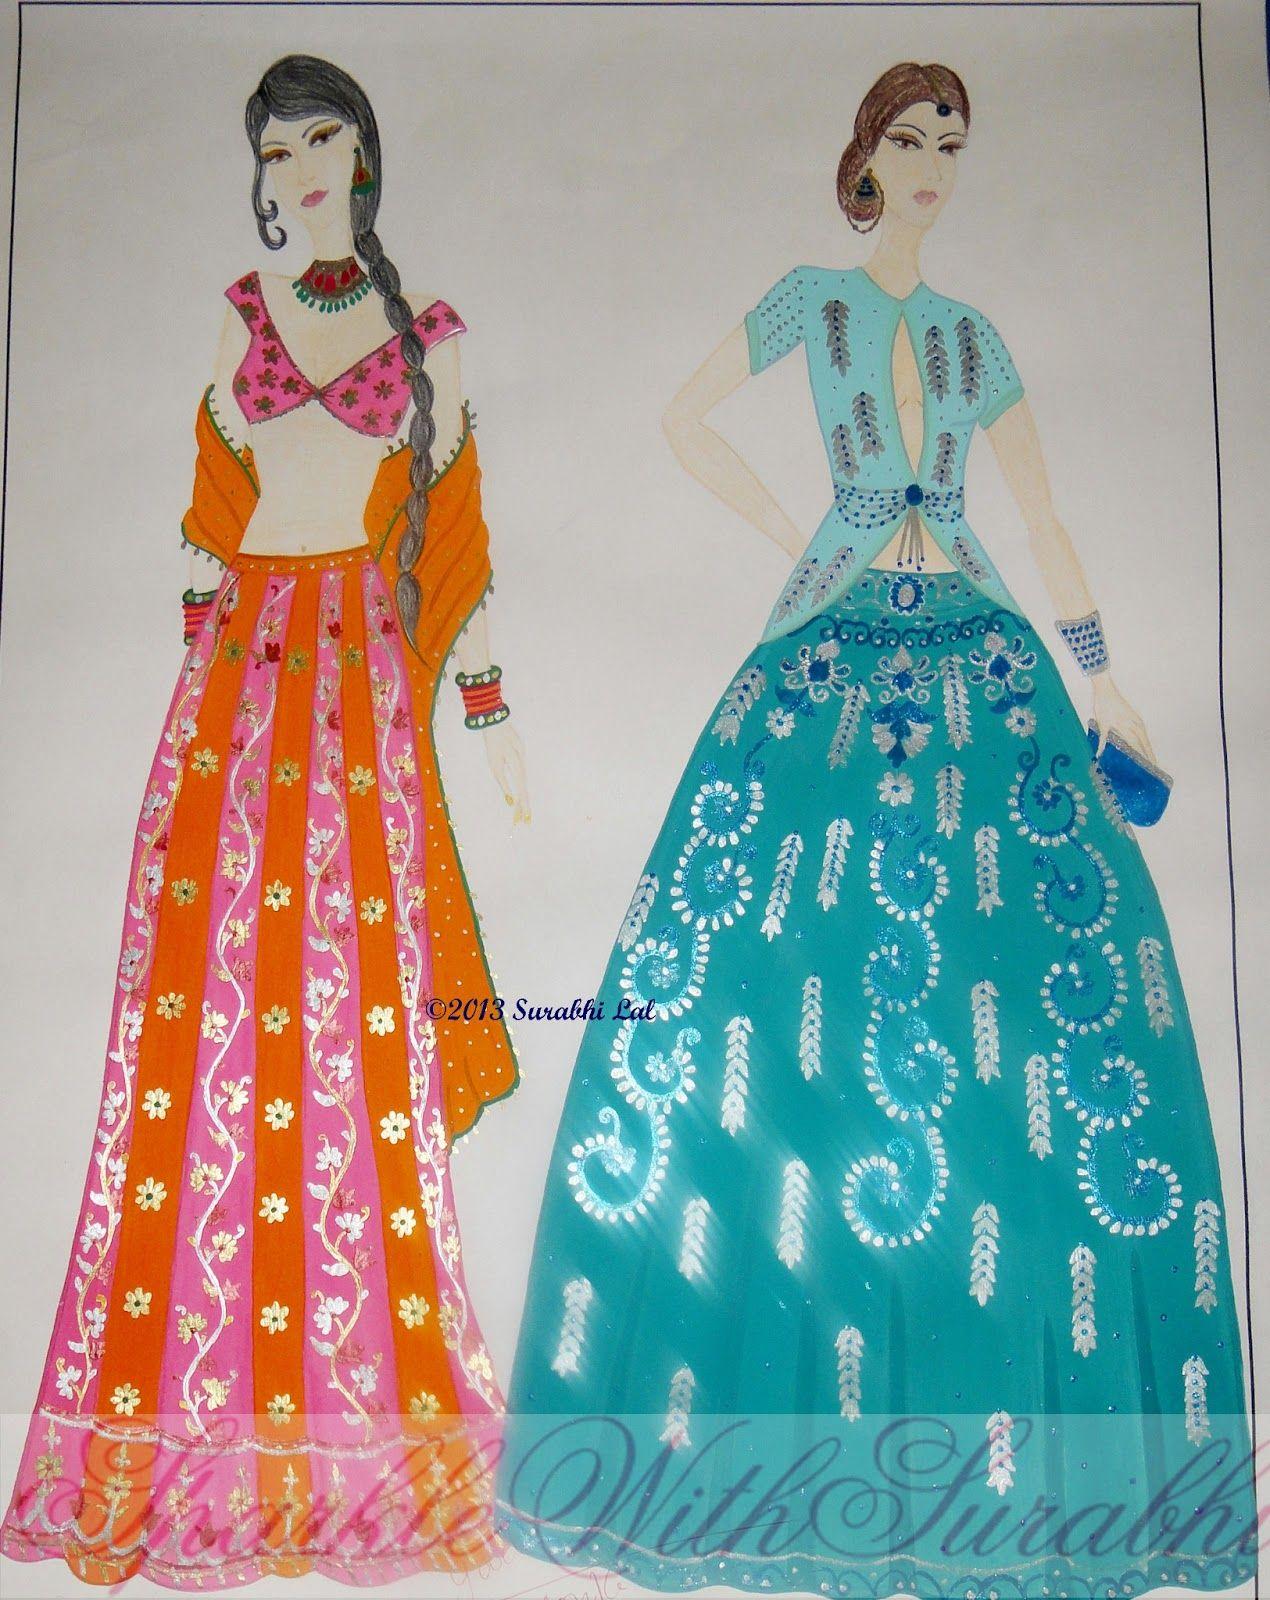 Wedding Illustrations   Indian Wedding Illustration Pictures ...